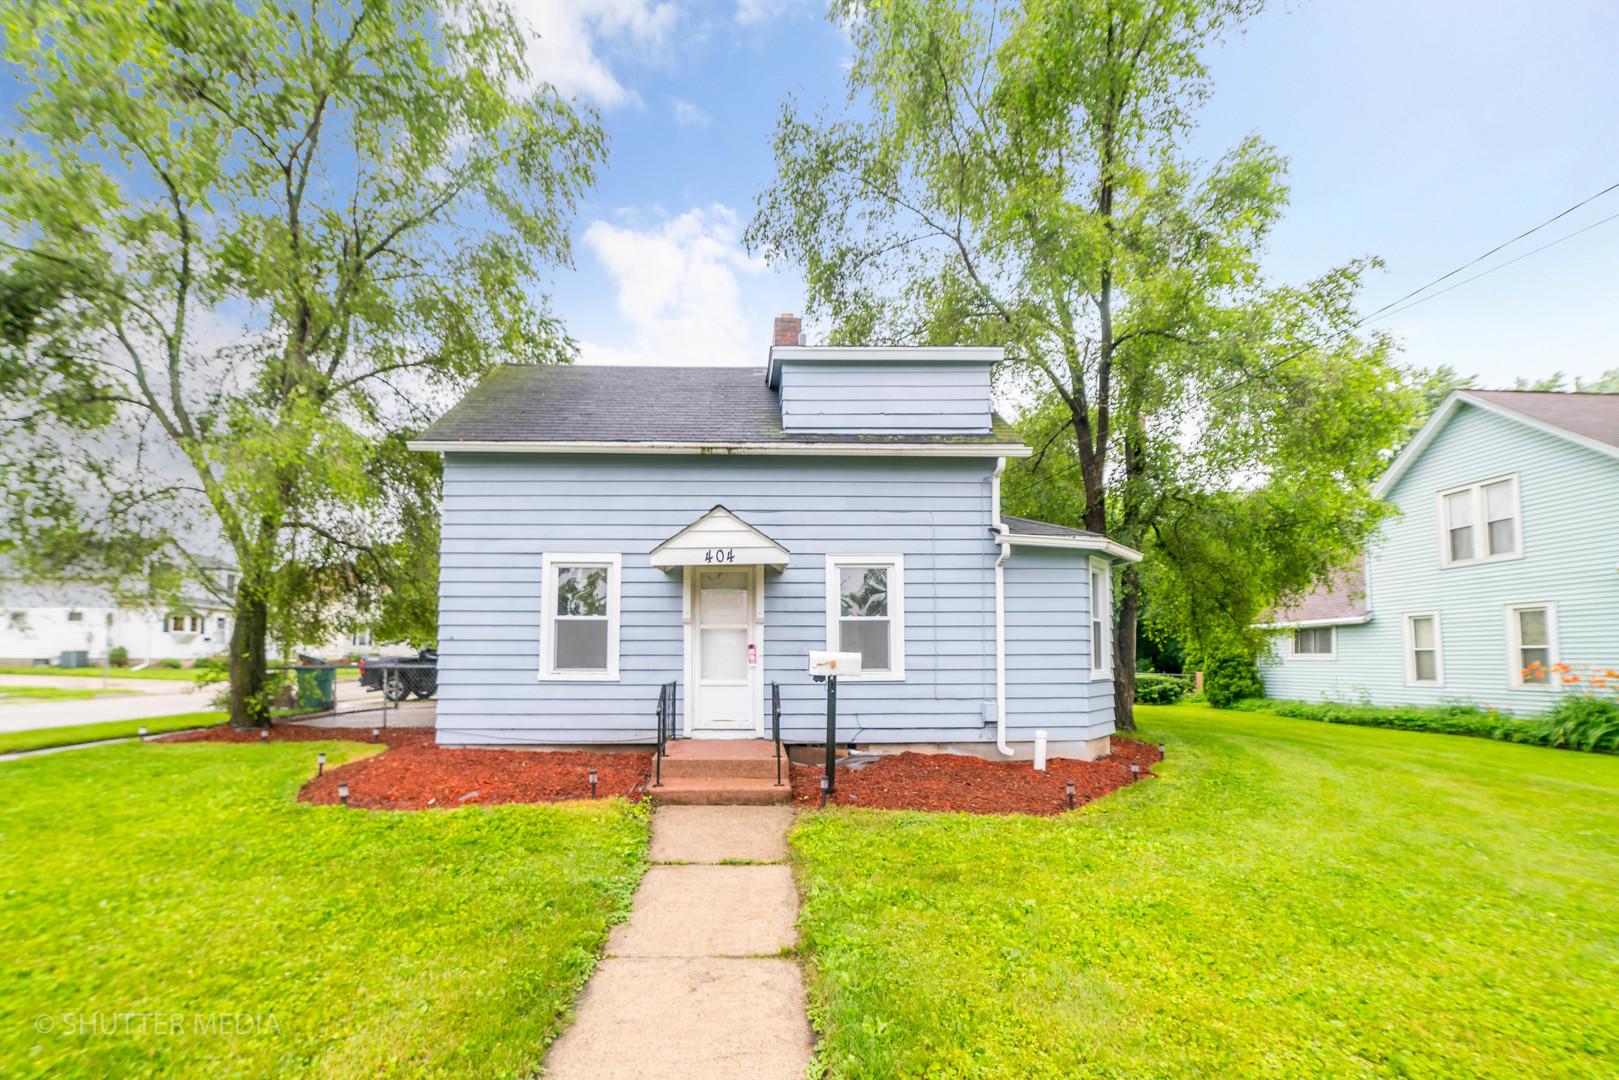 404 Charles ,Sycamore, Illinois 60178